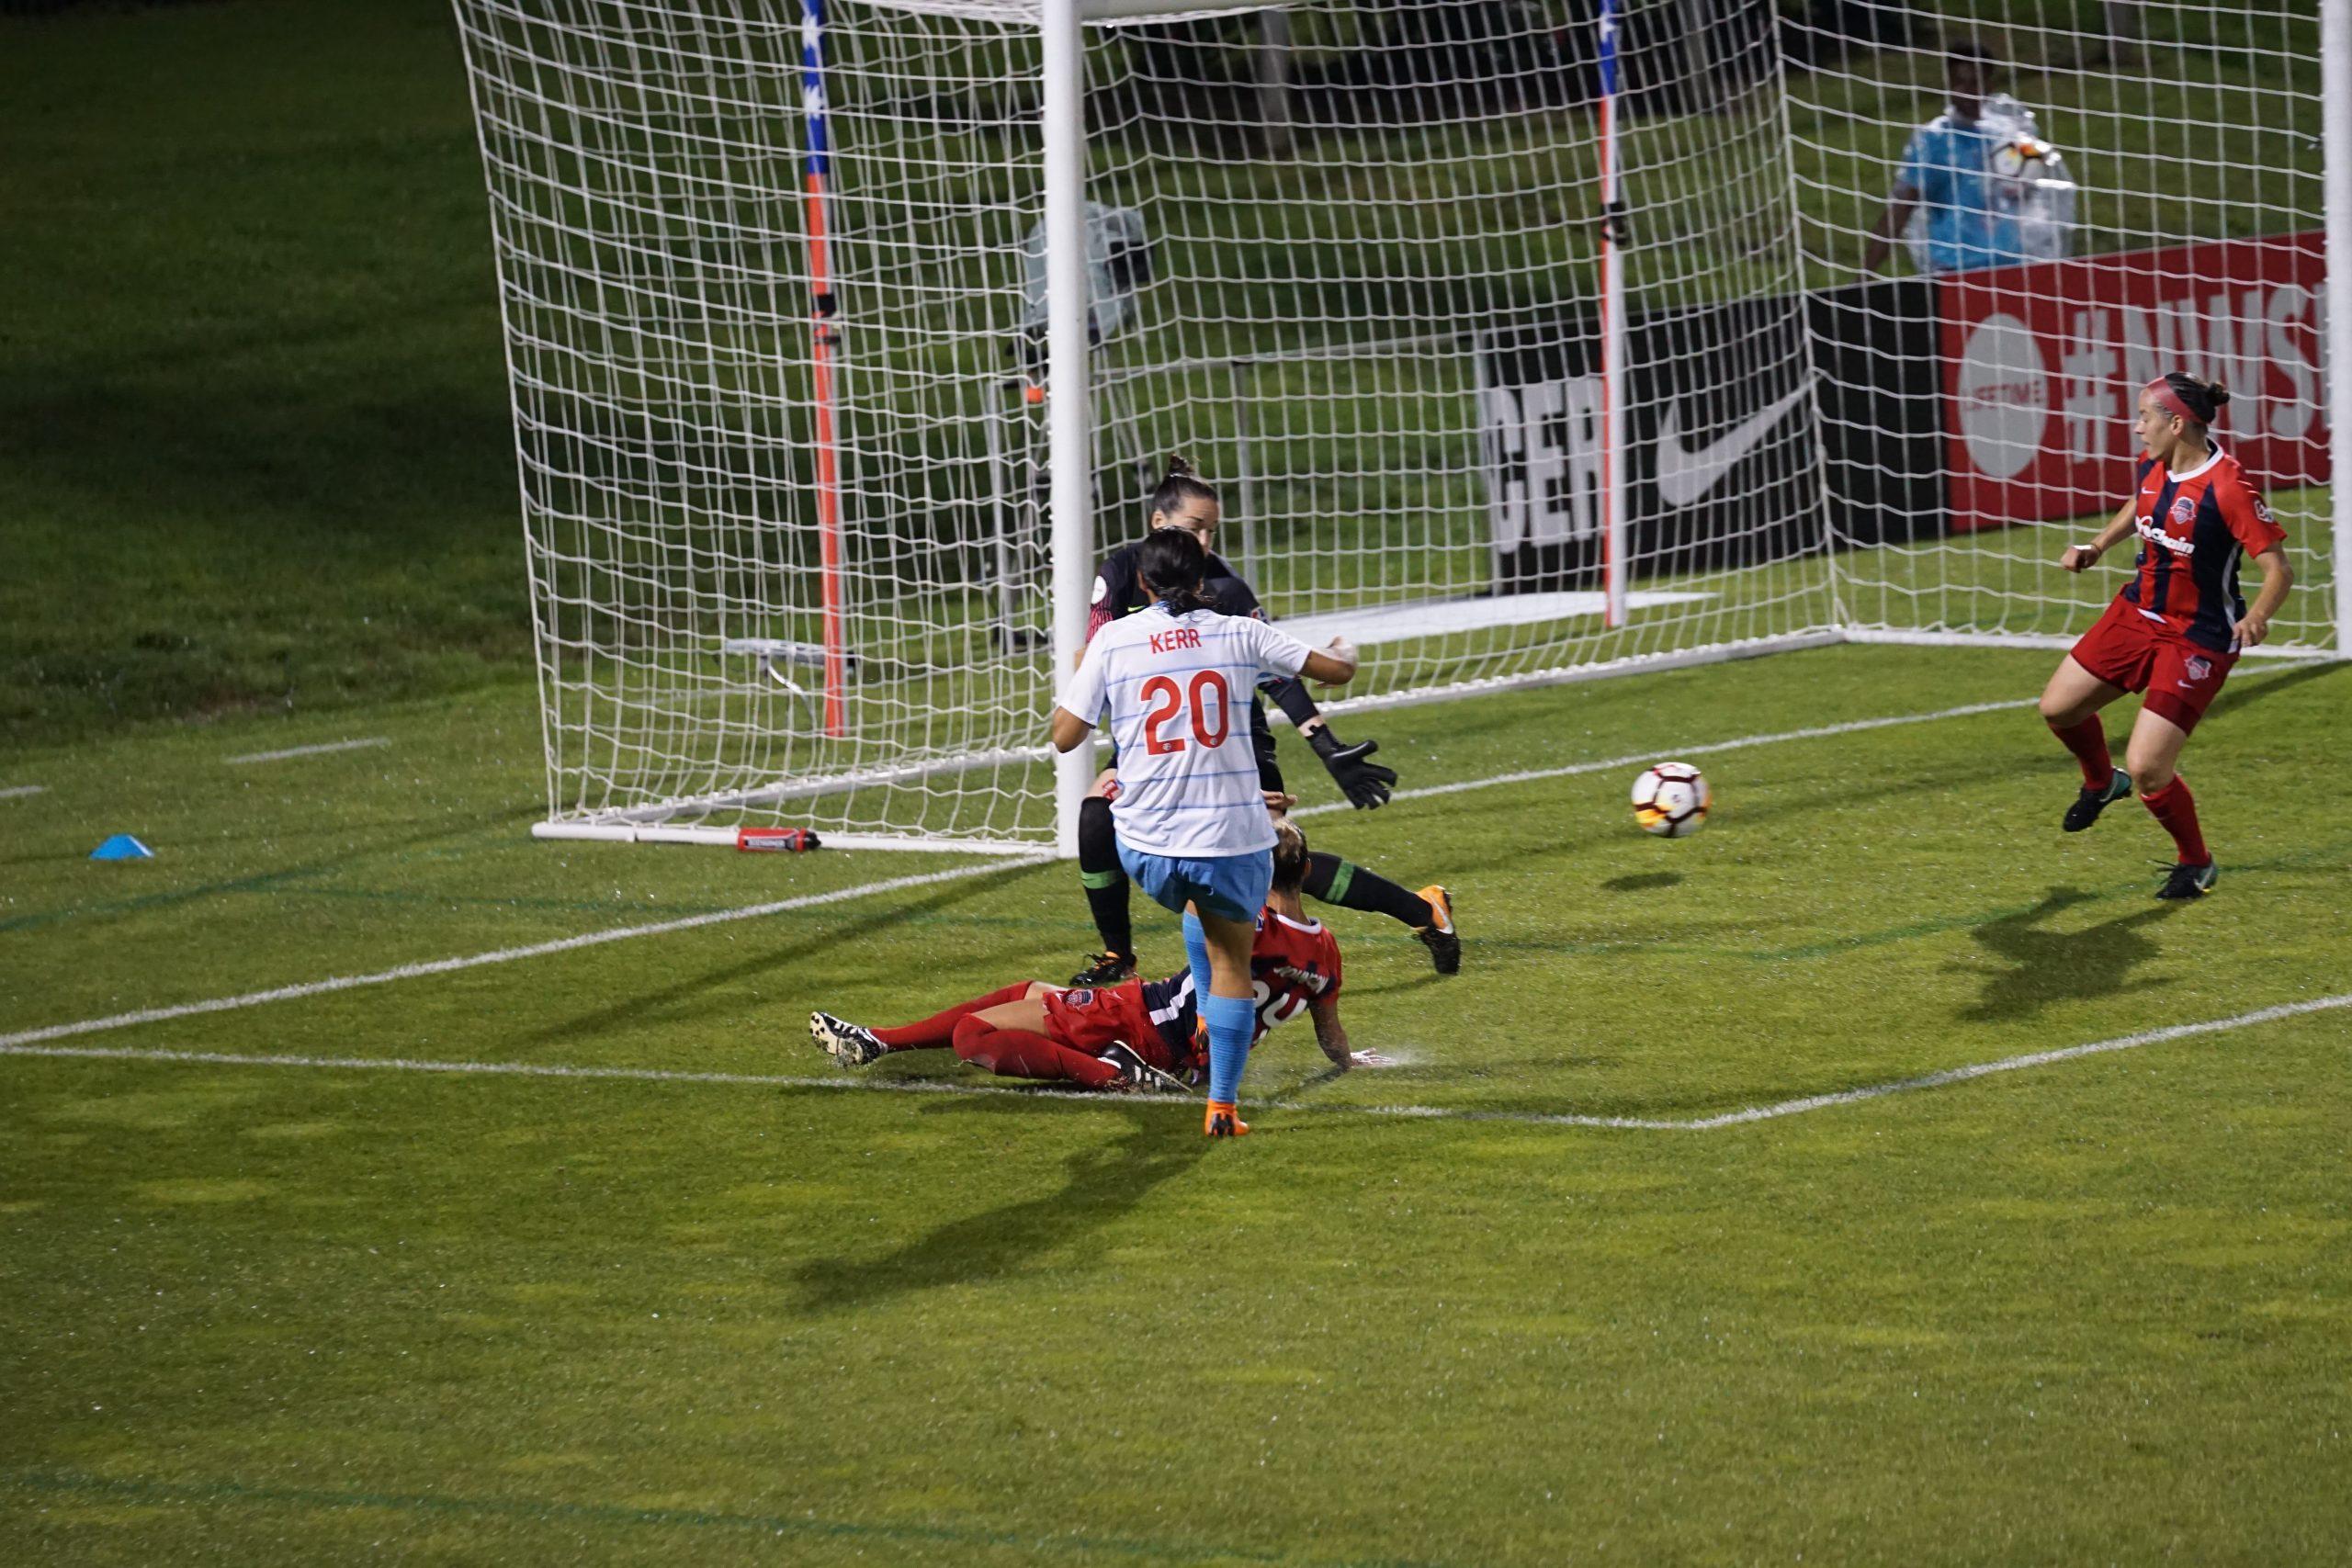 Sam Kerr scores a goal